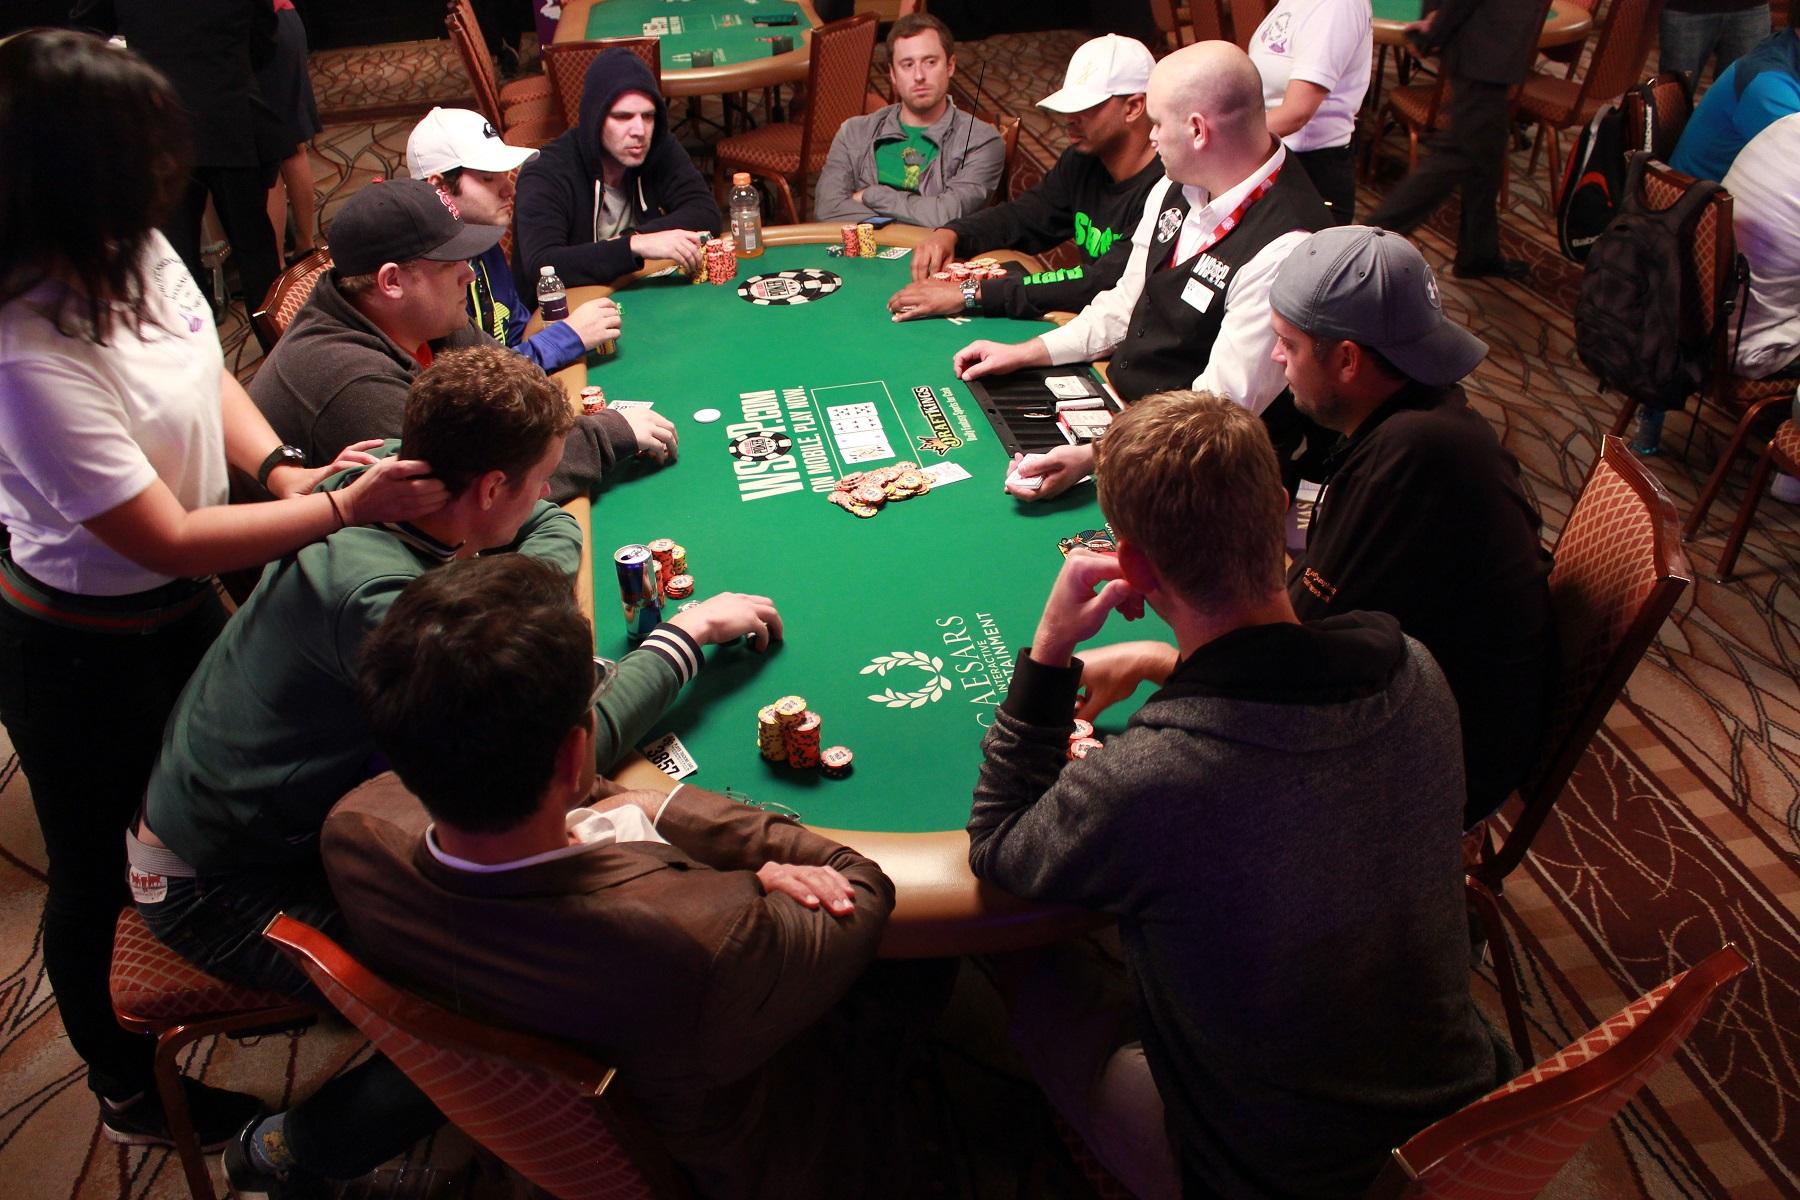 WSOP 2015-ME: temps calme